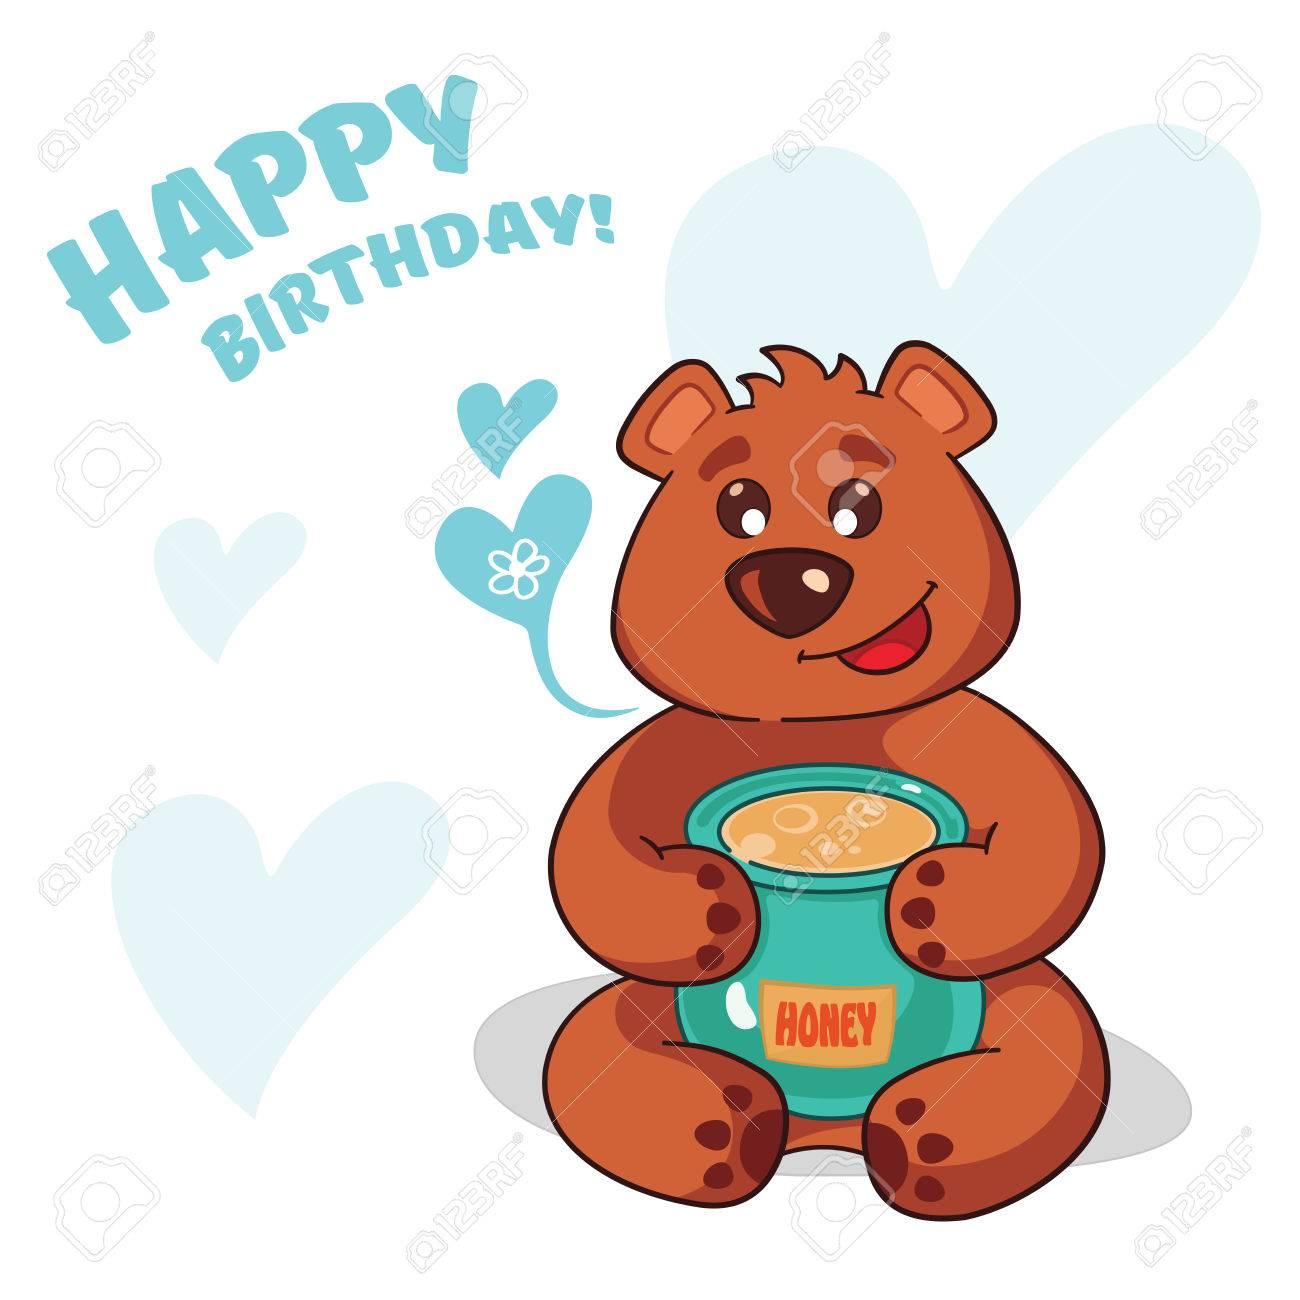 Cute Teddy Bear Who Wants To Wish You A Happy Birthday Warm